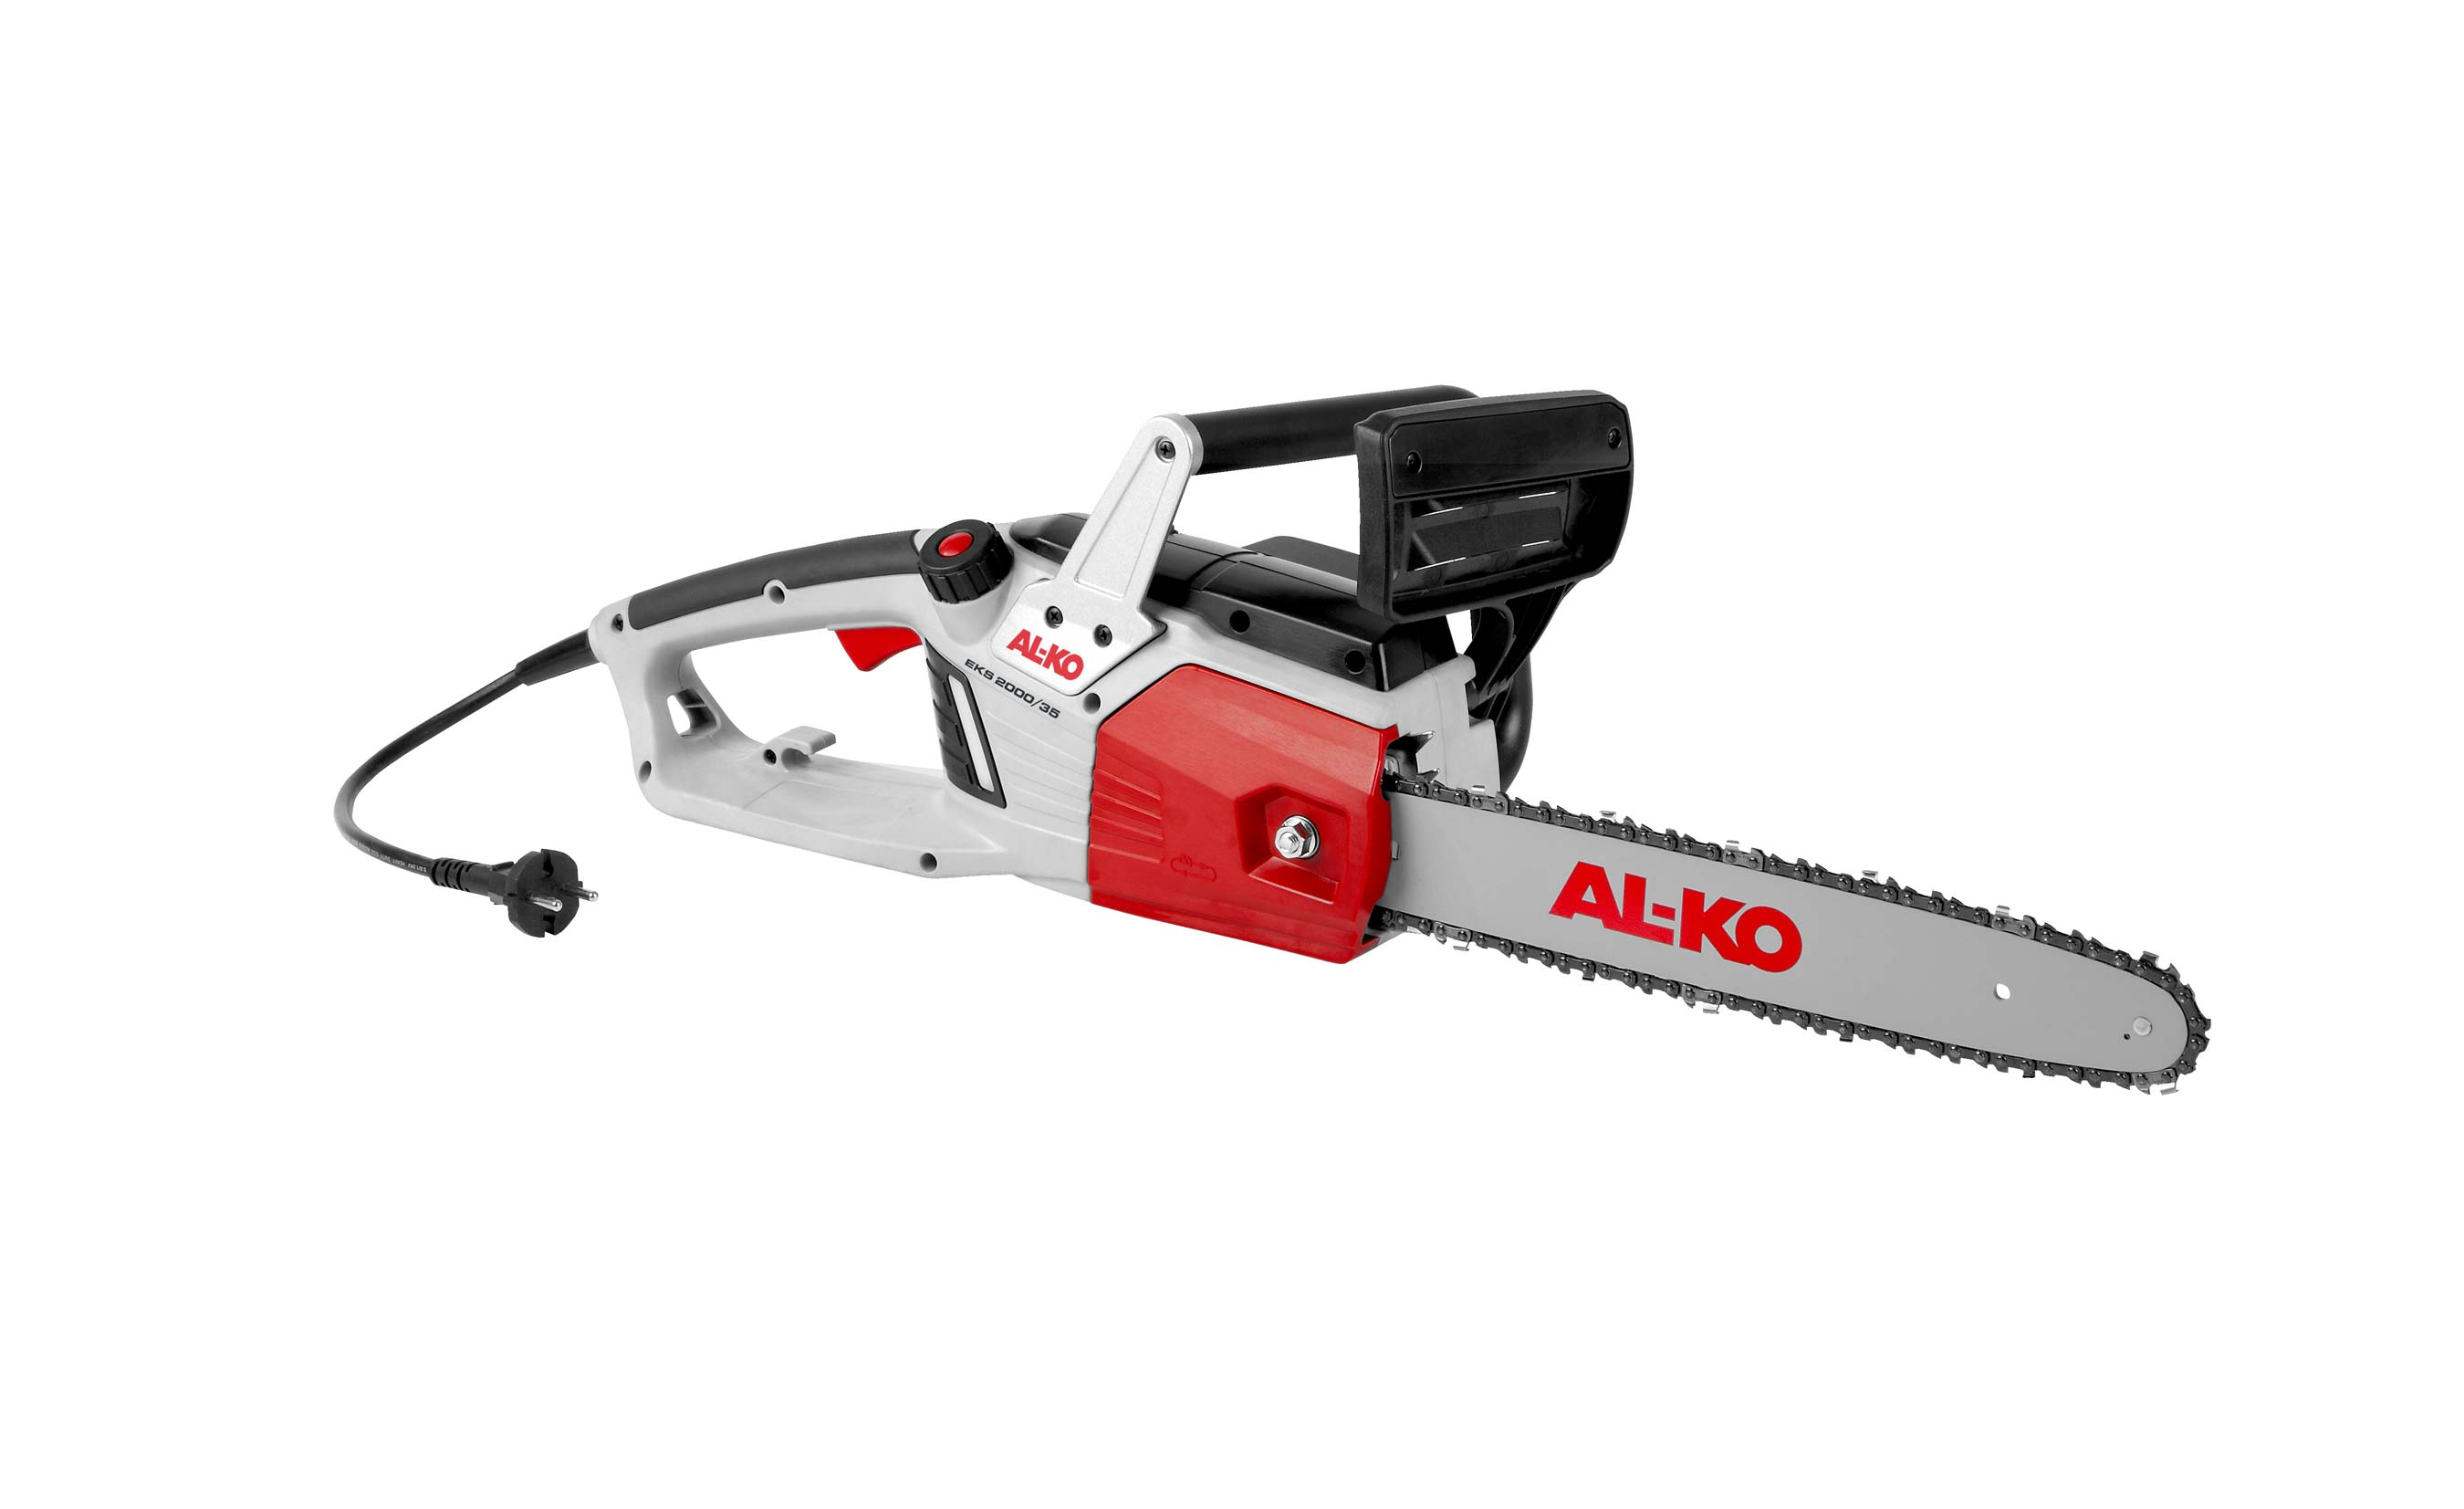 AL-KO Elektro Kettensäge / Motorsäge EKS 200/35 Schwertlänge 35cm Bild 1